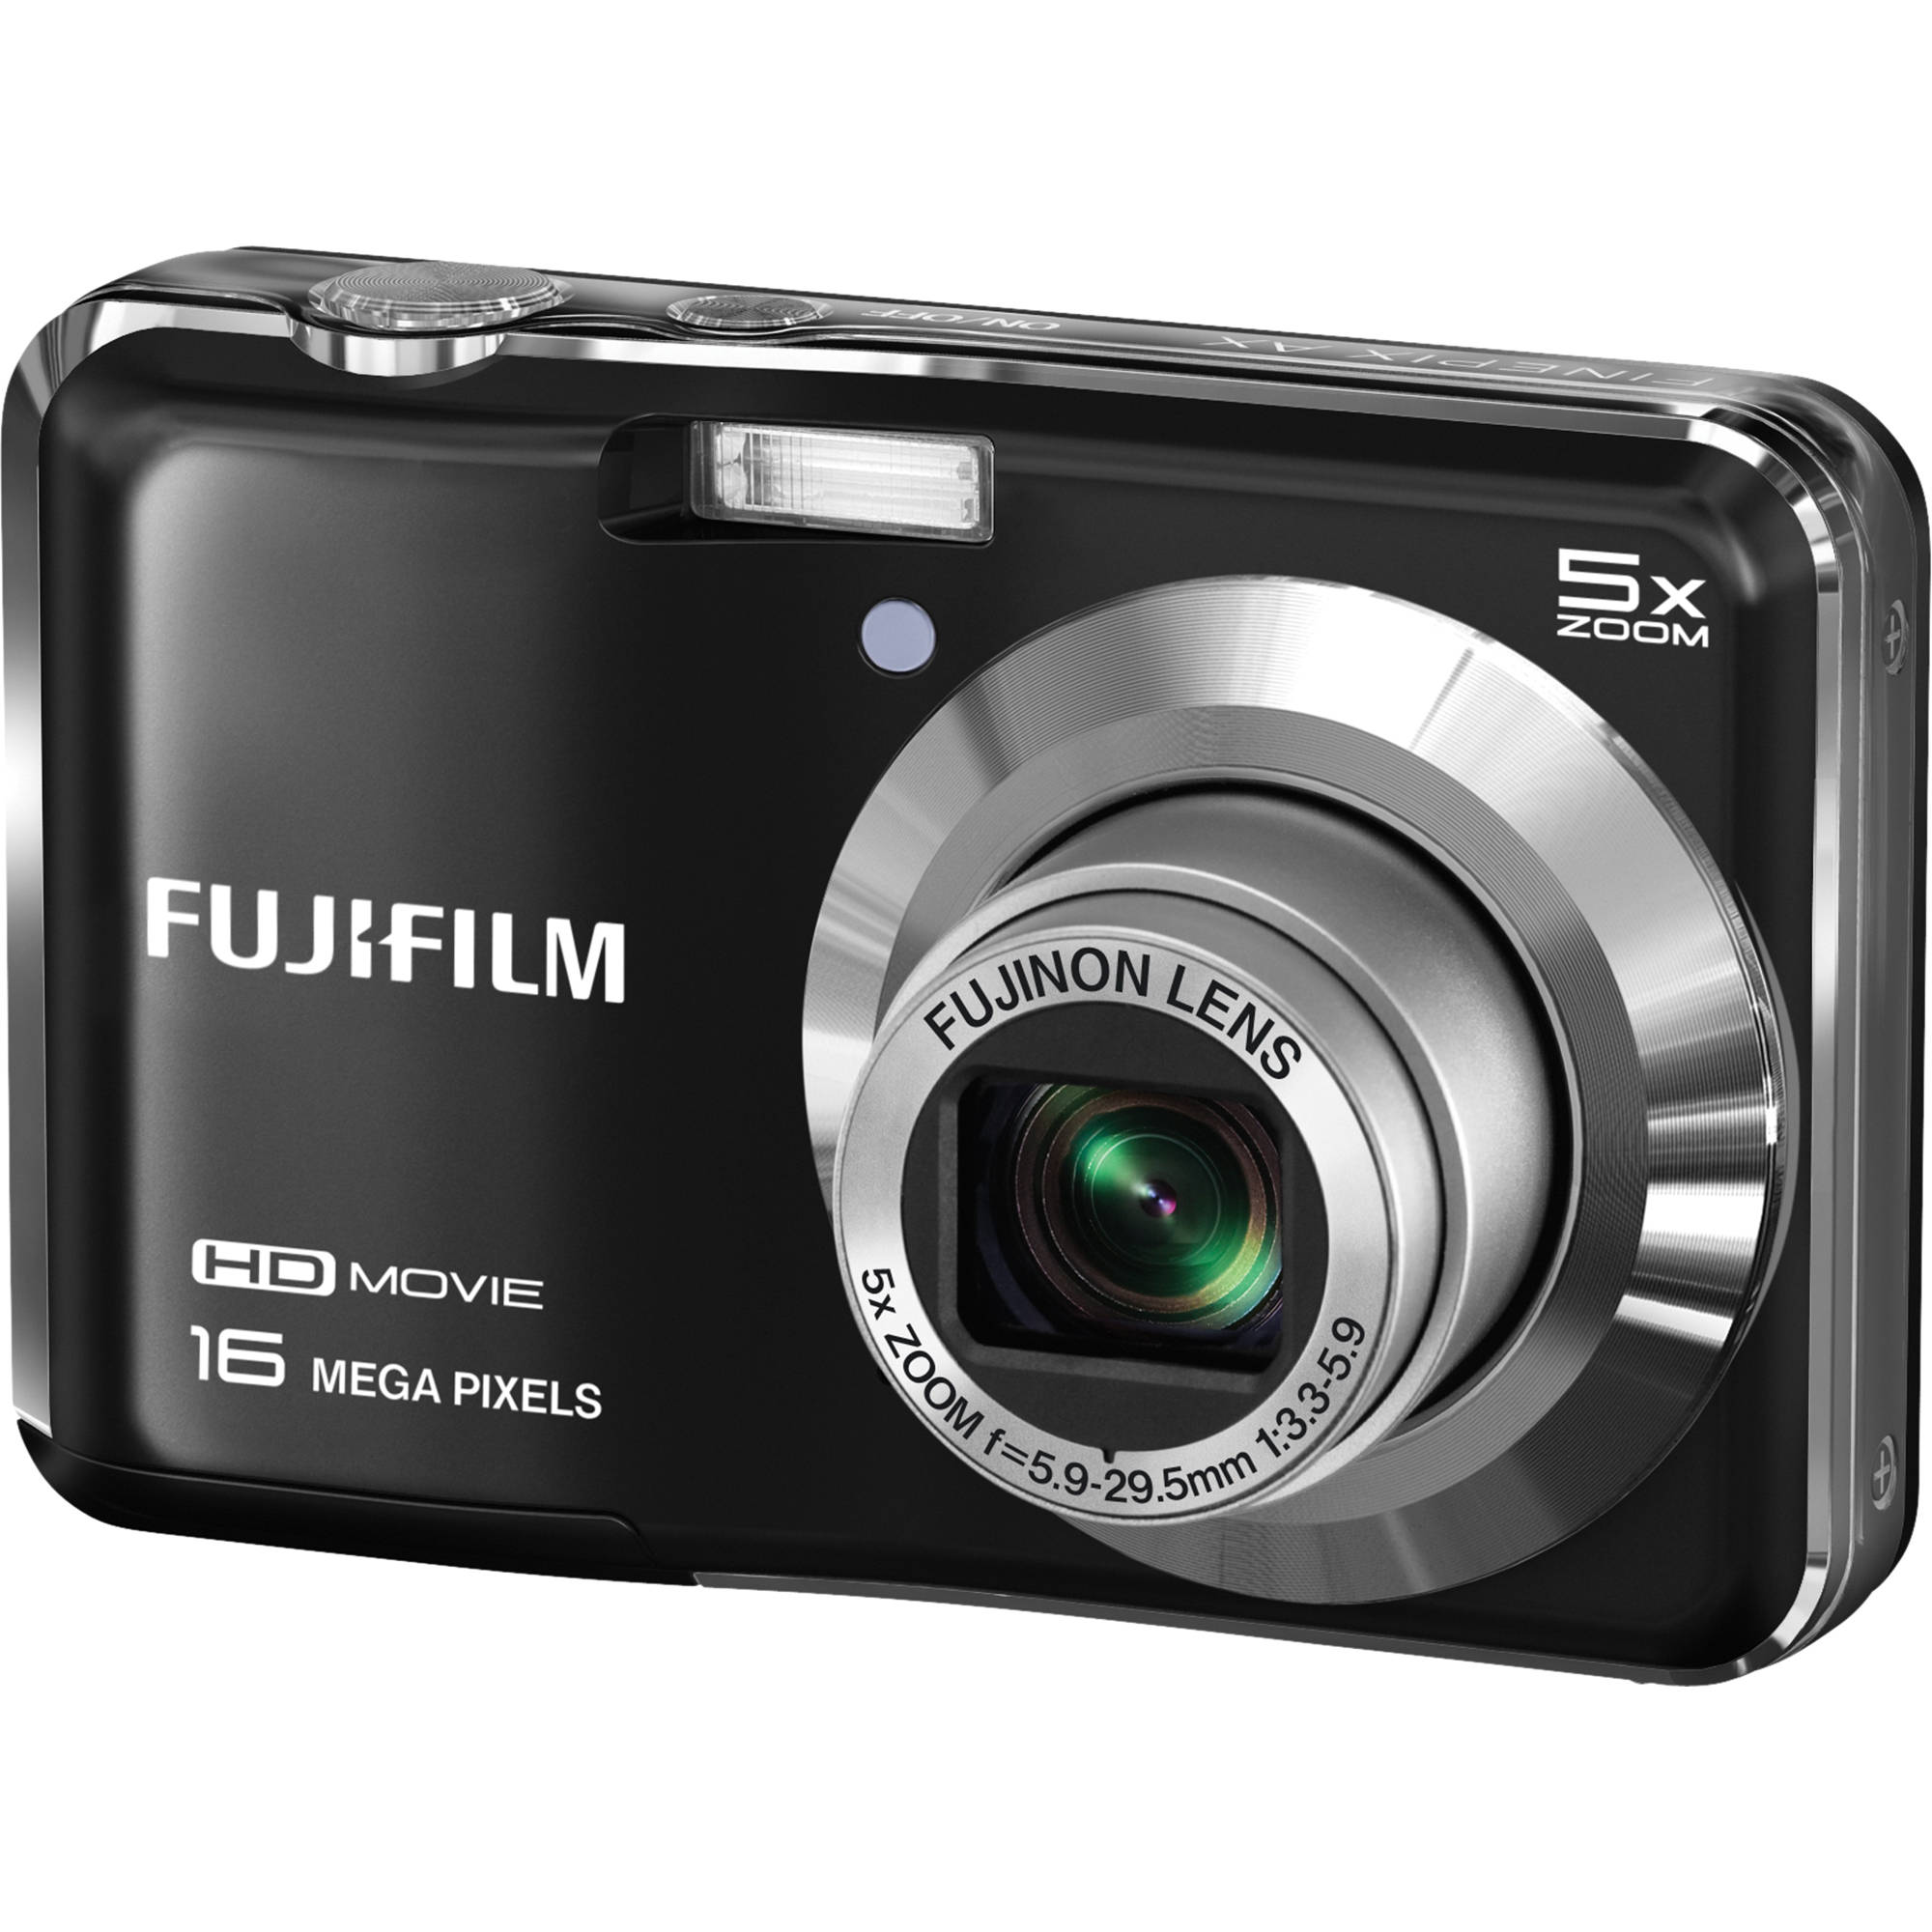 Fuji Digital Cameras: FUJIFILM FinePix AX650 Digital Camera (Black) 16277992 B&H